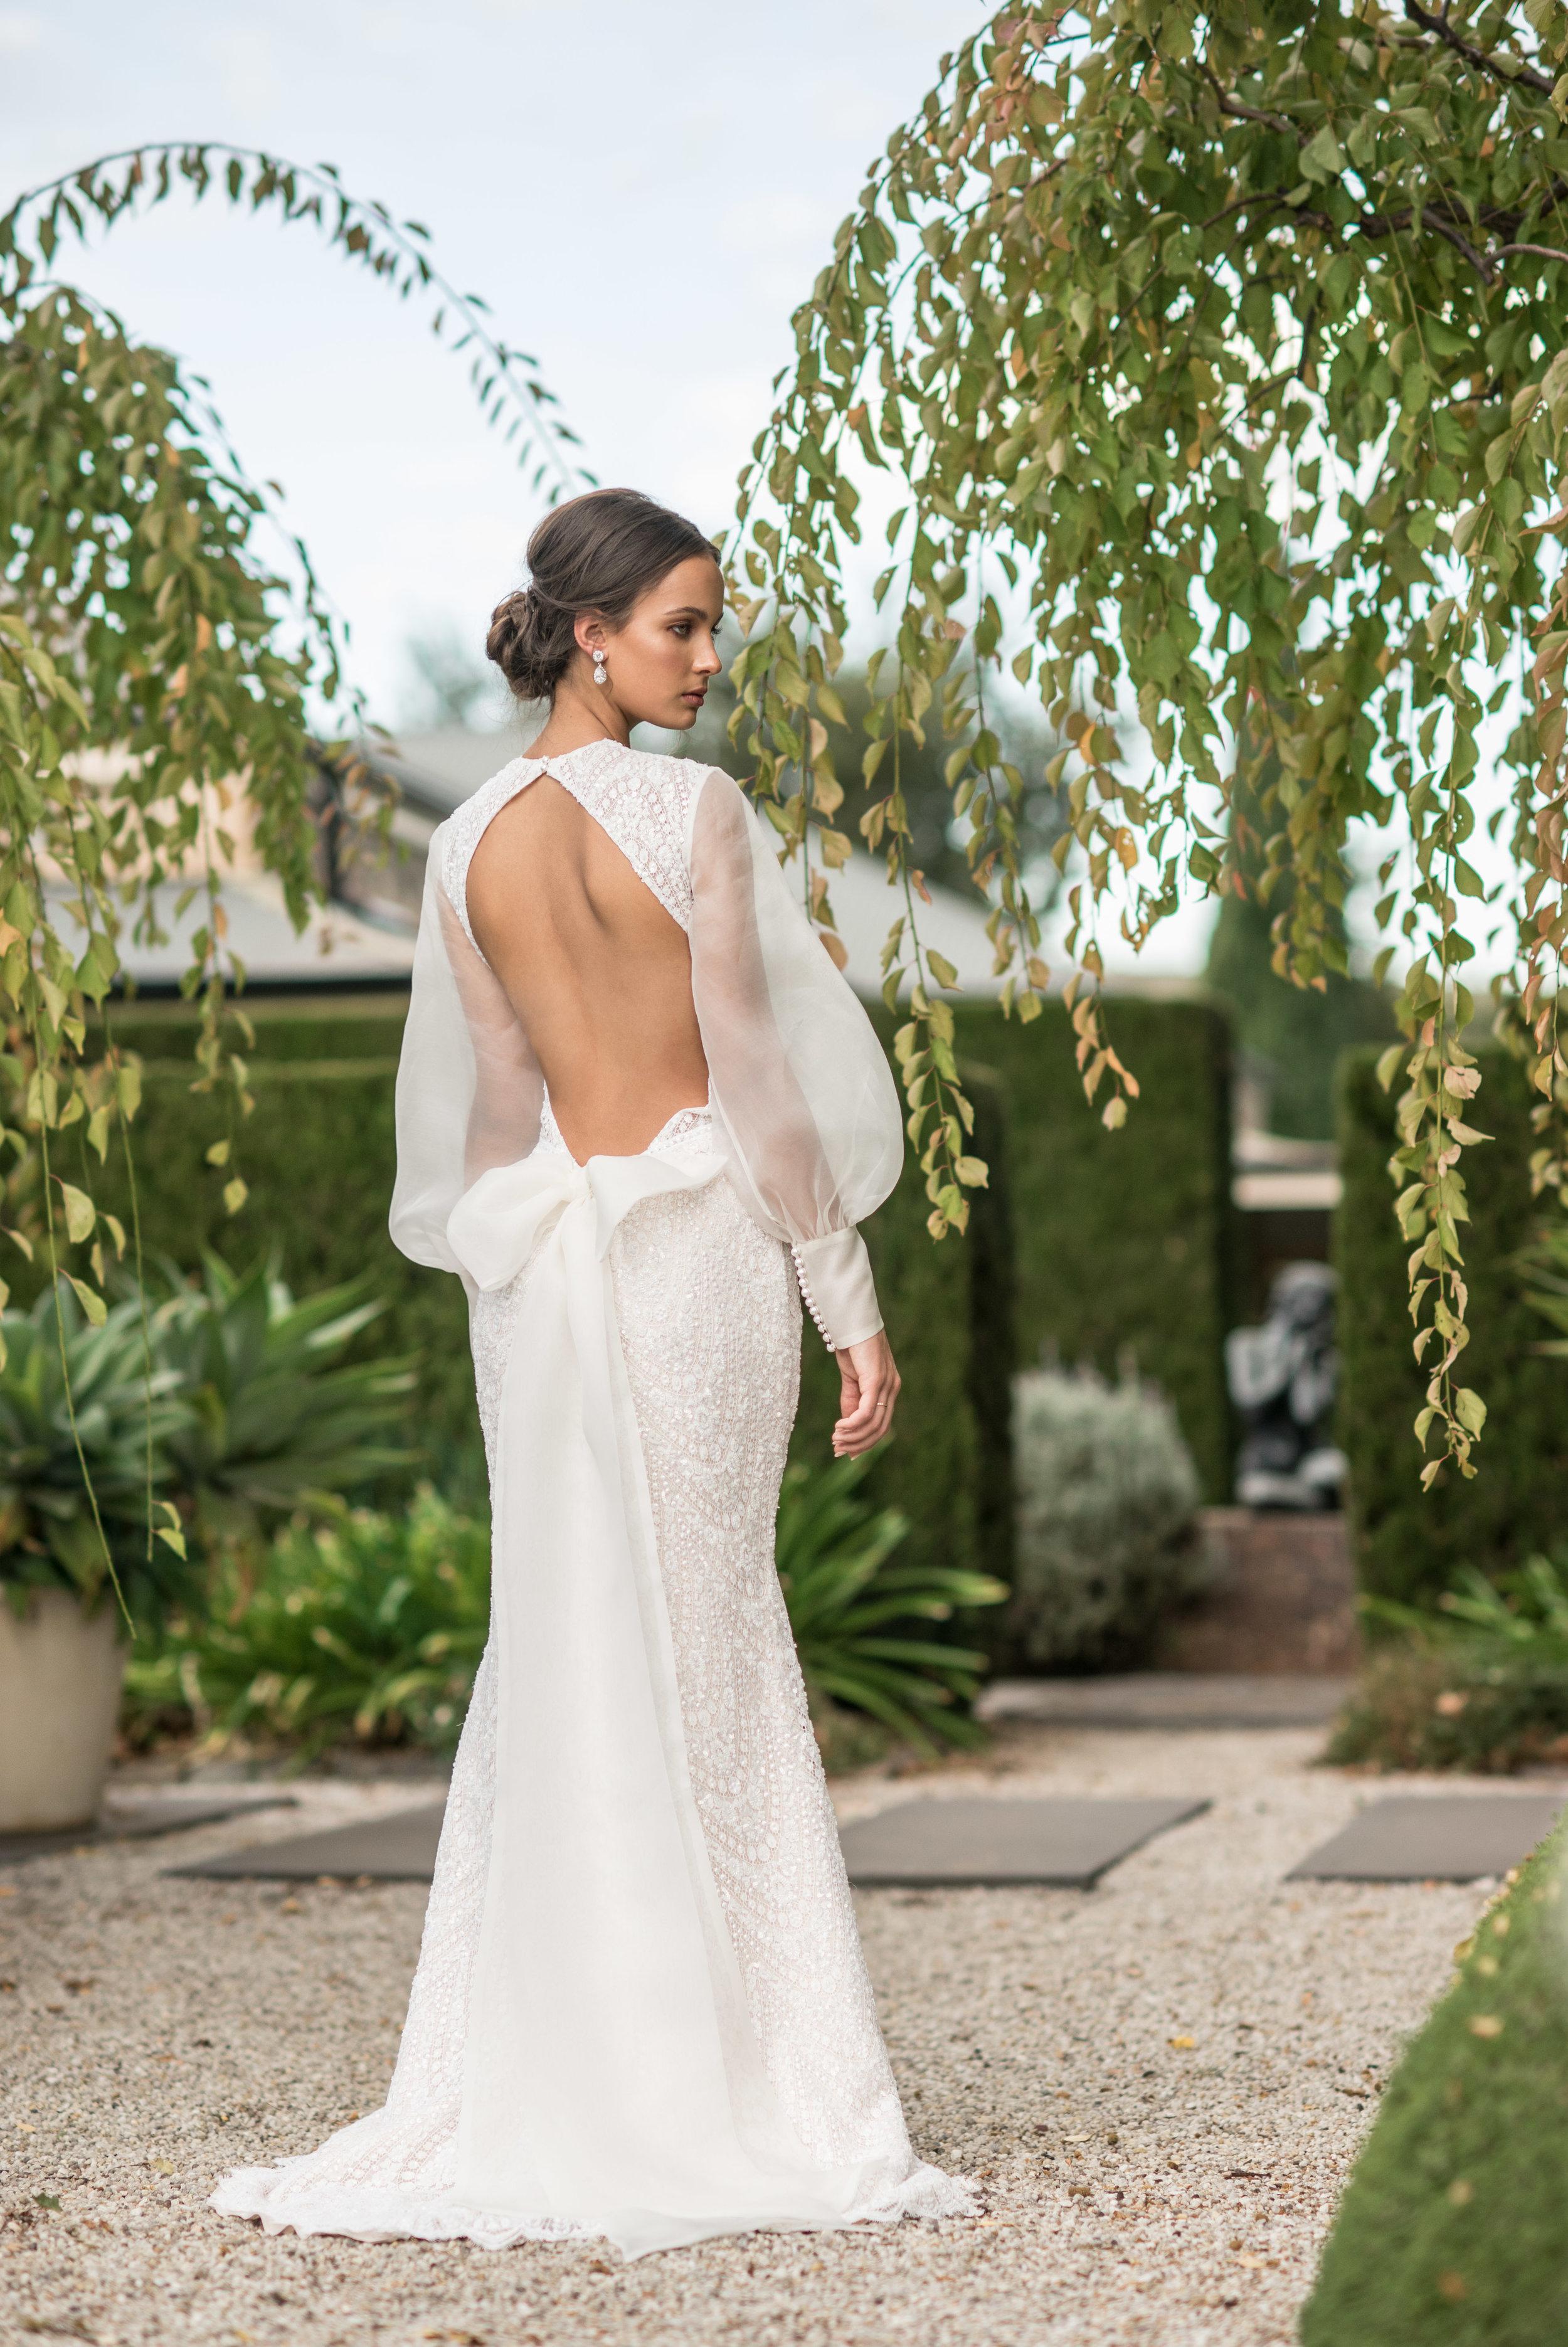 Fashion with Mirella , Bridal , Wedding dress, on location Mandalay House and Garden.  271 Back Callington Rd, St Ives SA 5252  Photo: Nick Clayton